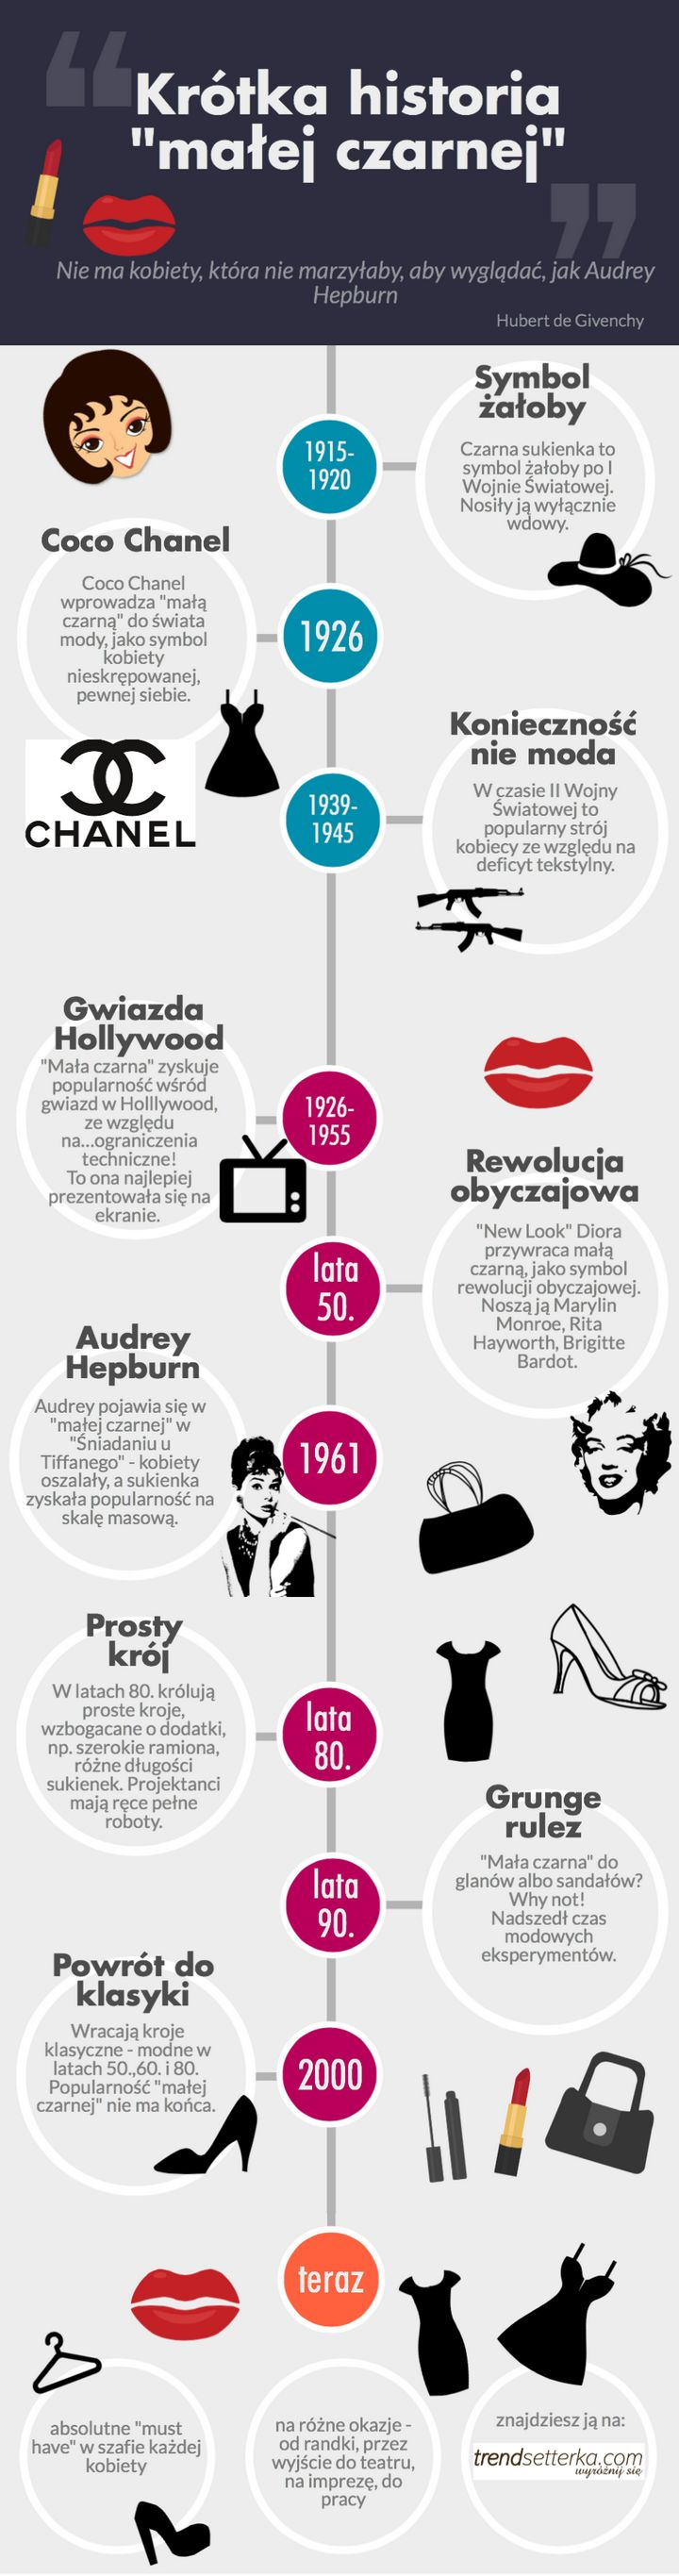 history of black dress #blackdress #audreyhepburn #fashion